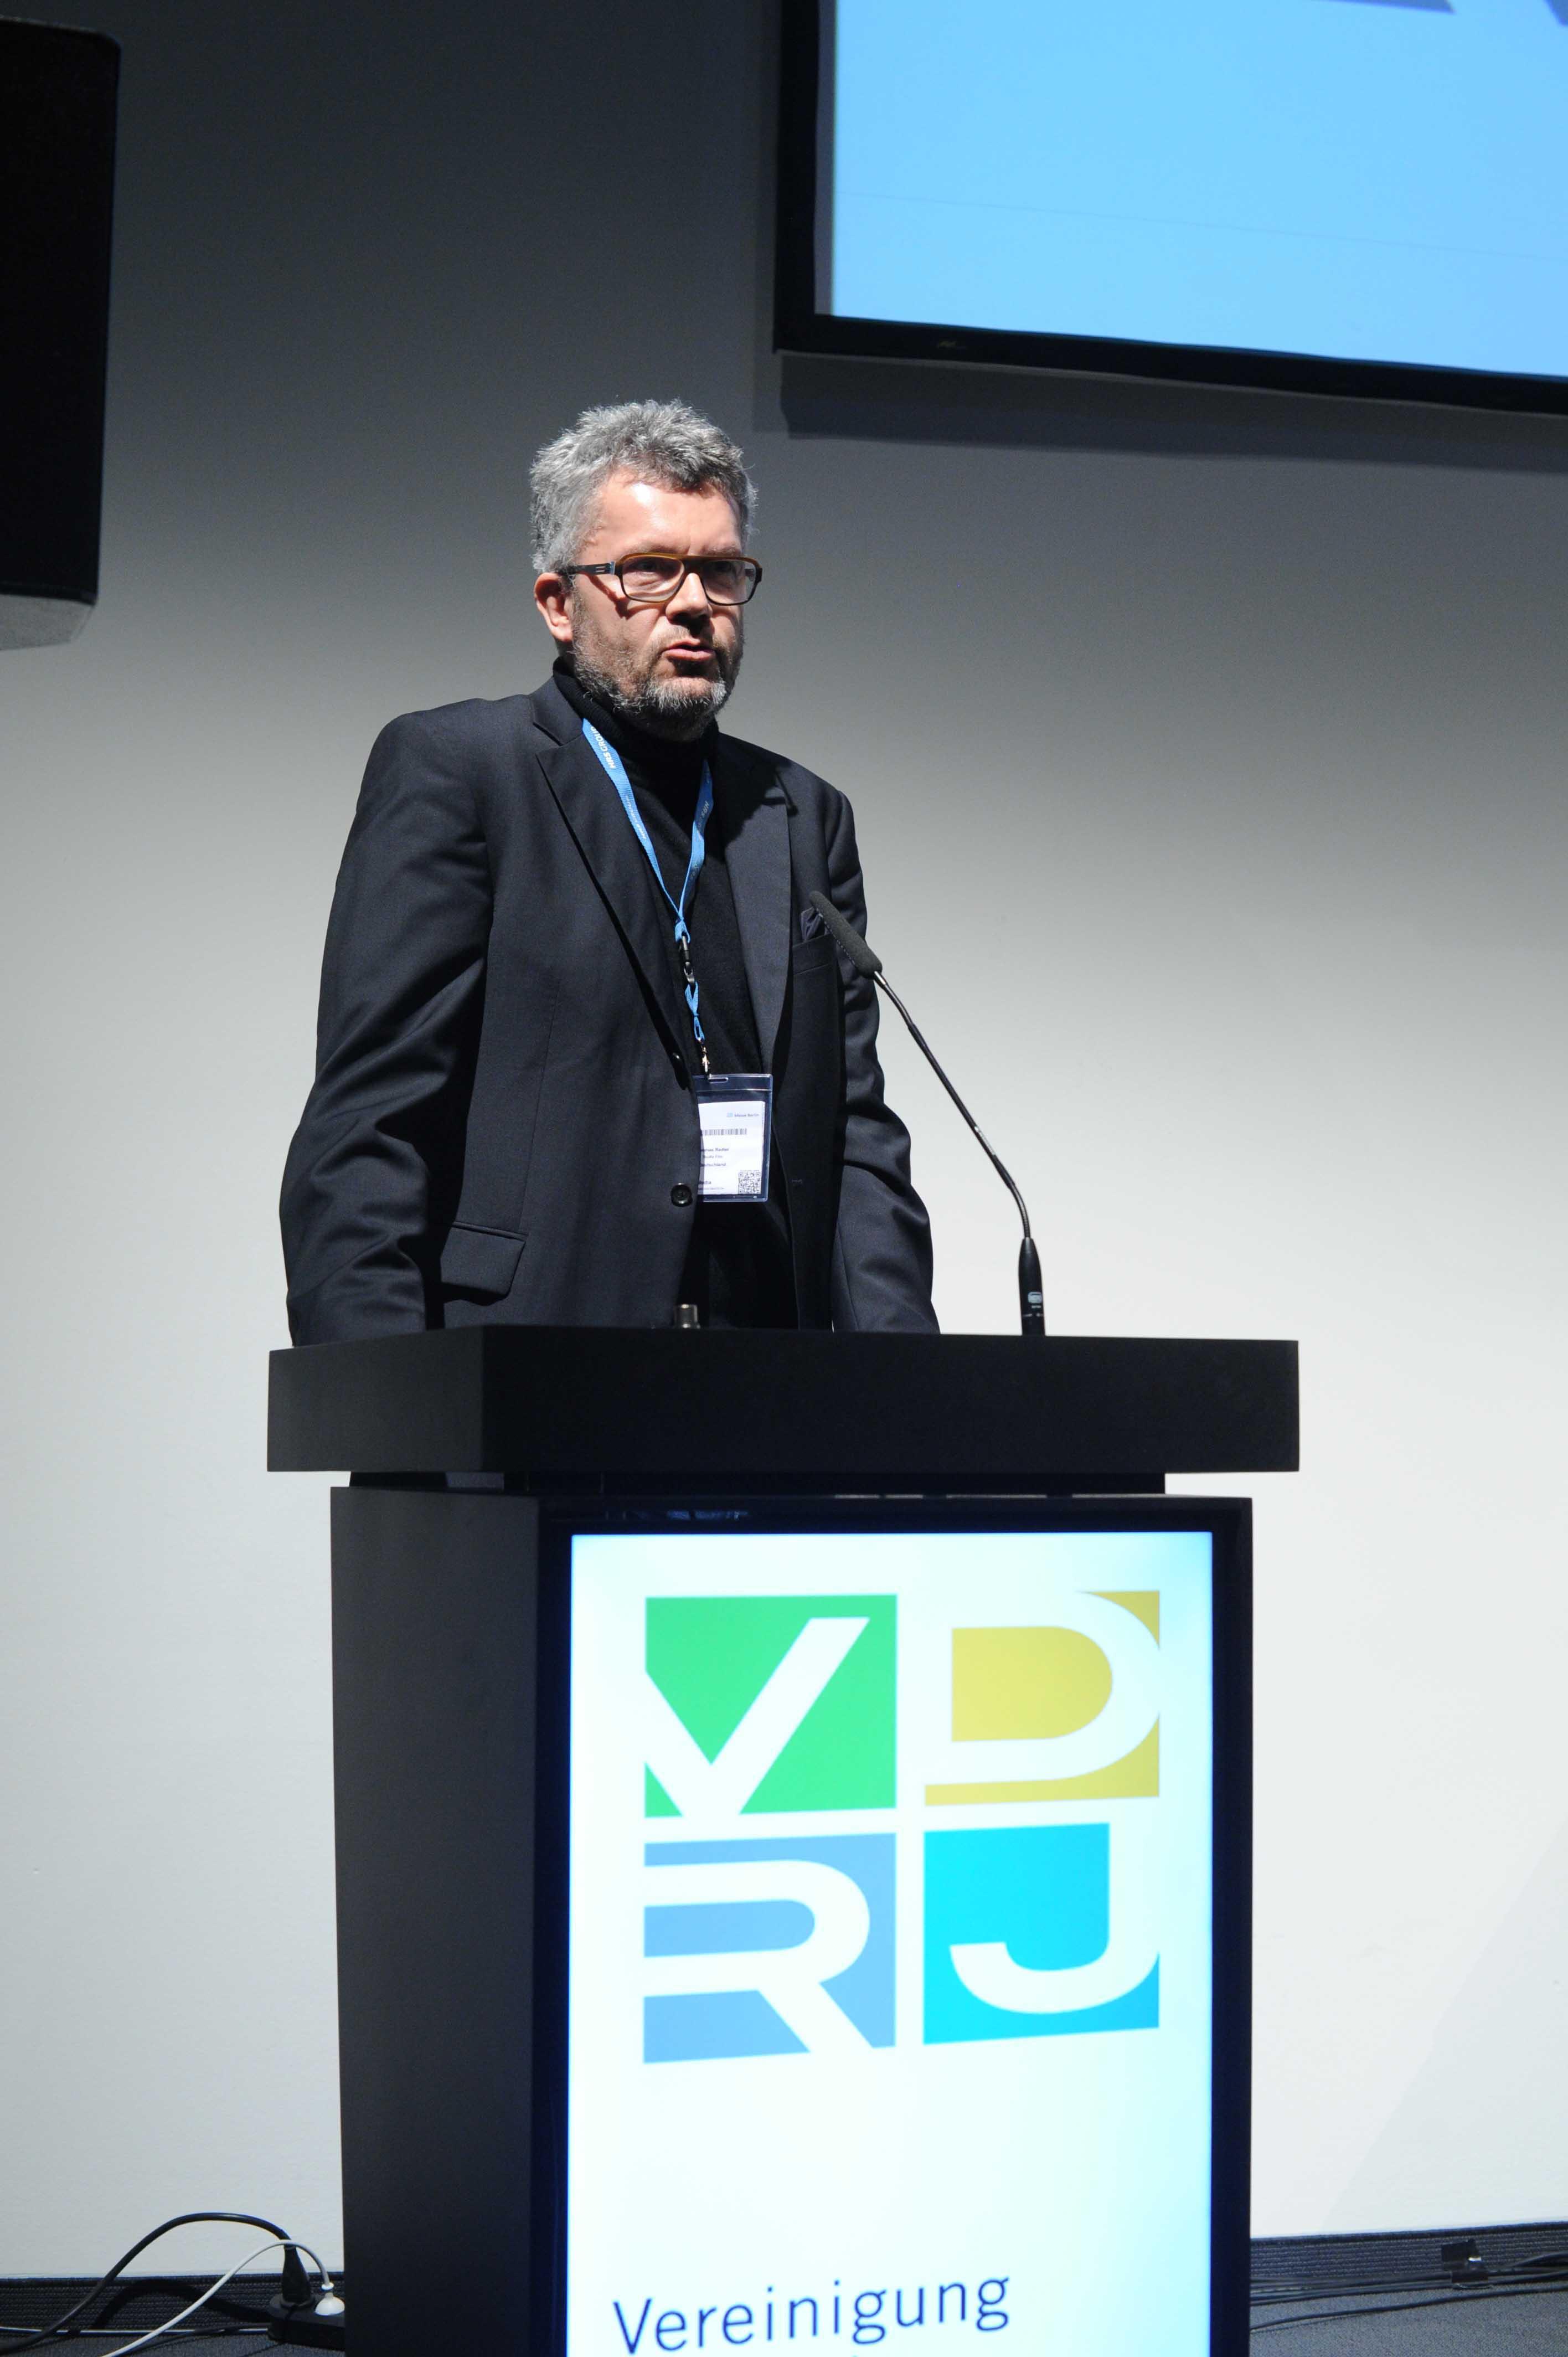 Columbus Film Preisverleihung 2015 Thomas Radler web